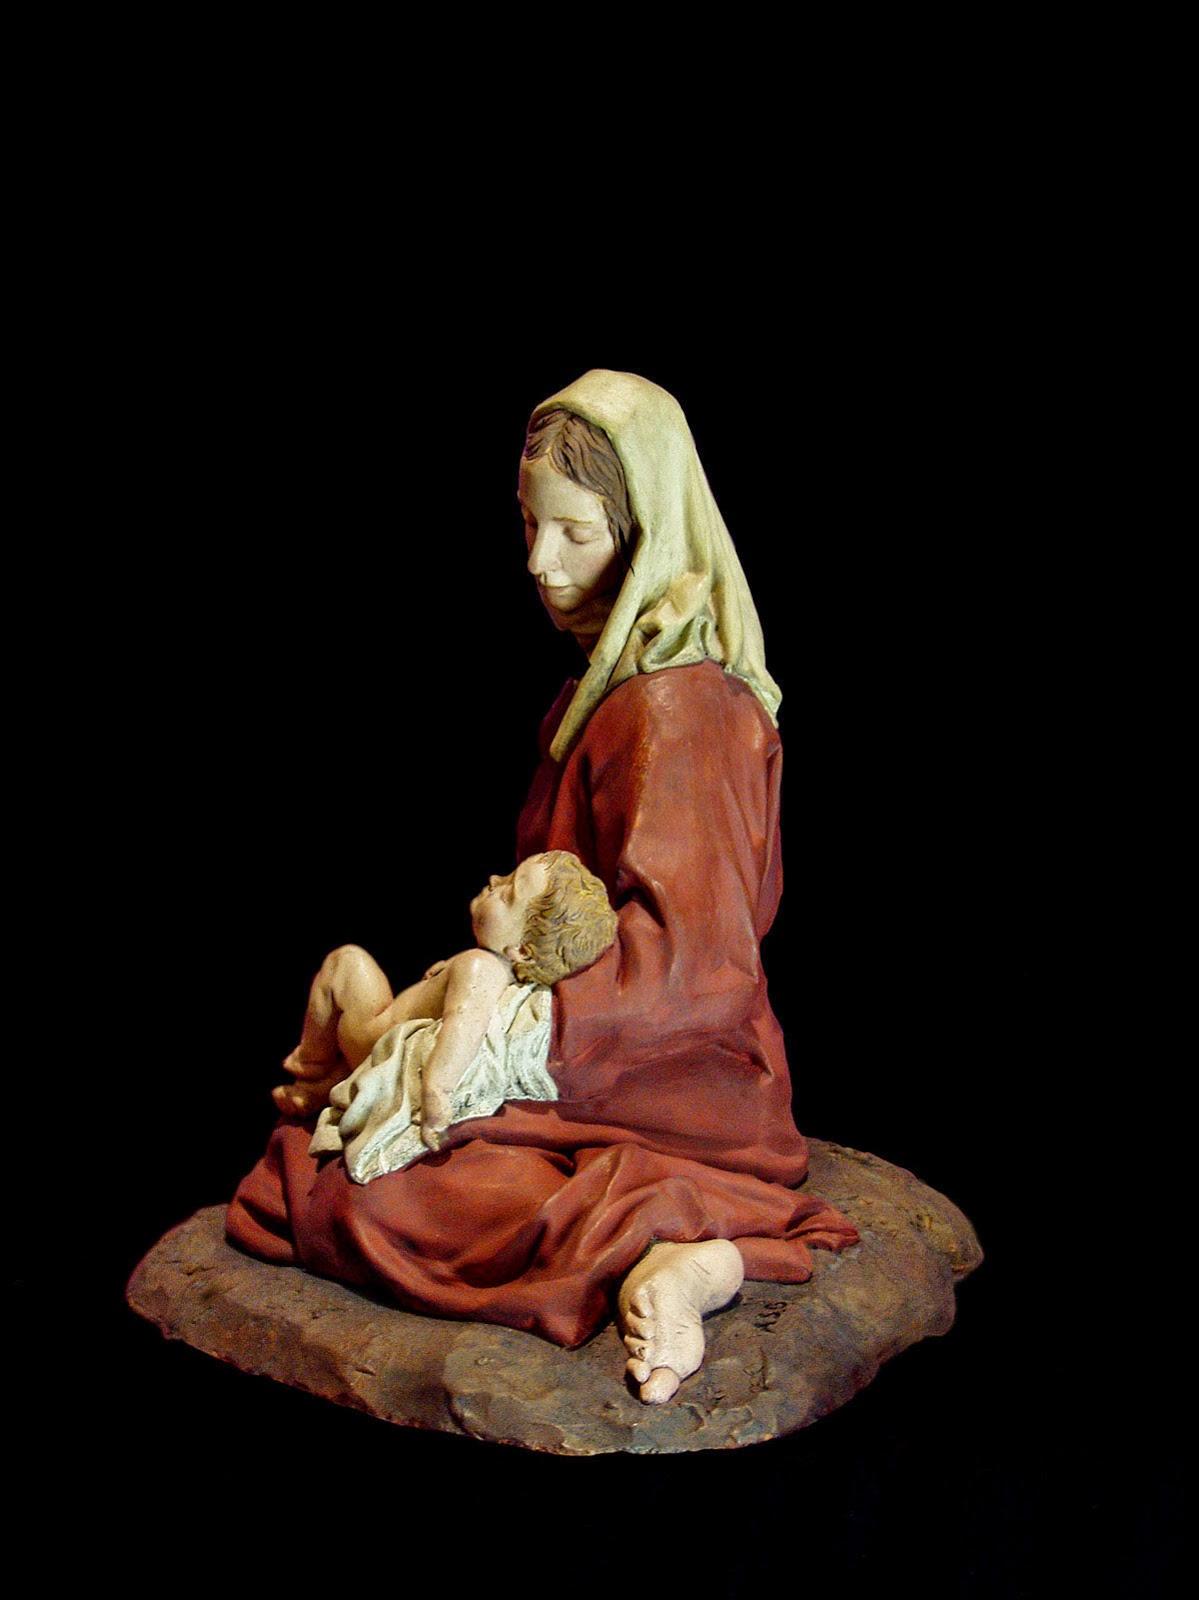 Nacimiento Belén Nativity krippe presepe Arturo Serra Gómez Barro cocido 4